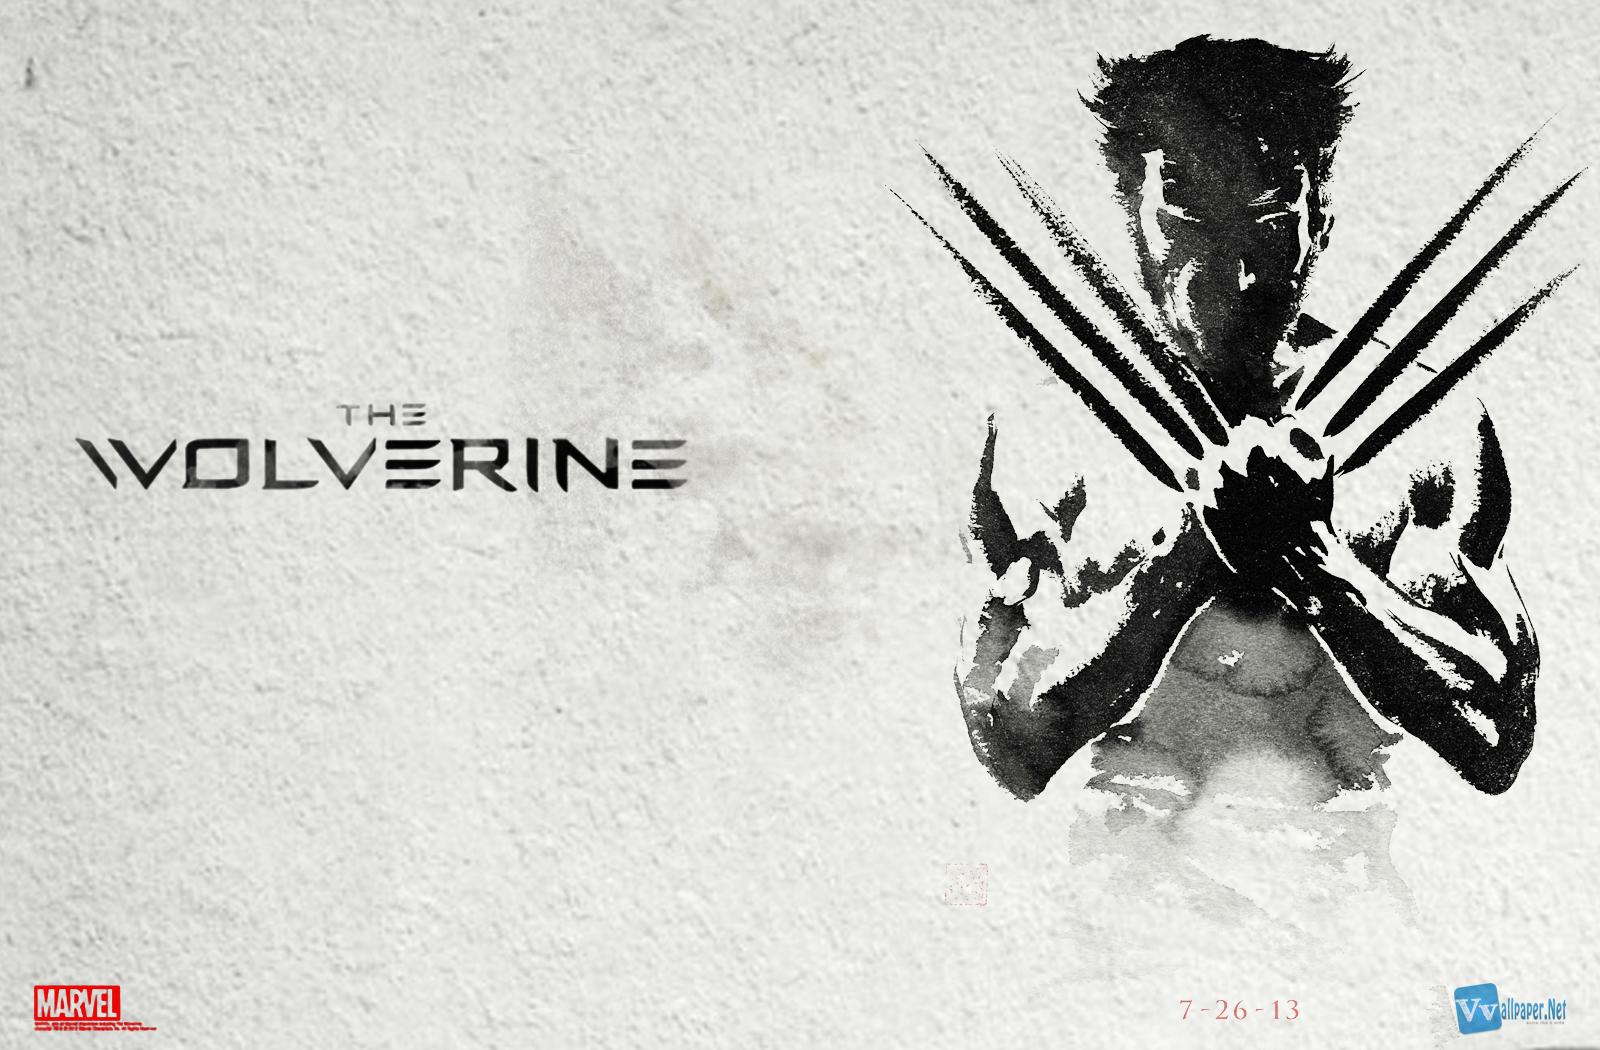 http://1.bp.blogspot.com/-u4E_5L29Kr4/UVT3aRZyiSI/AAAAAAAAB7Q/zOdLZ8cy_d8/s1600/The+Wolverine+2013.jpg